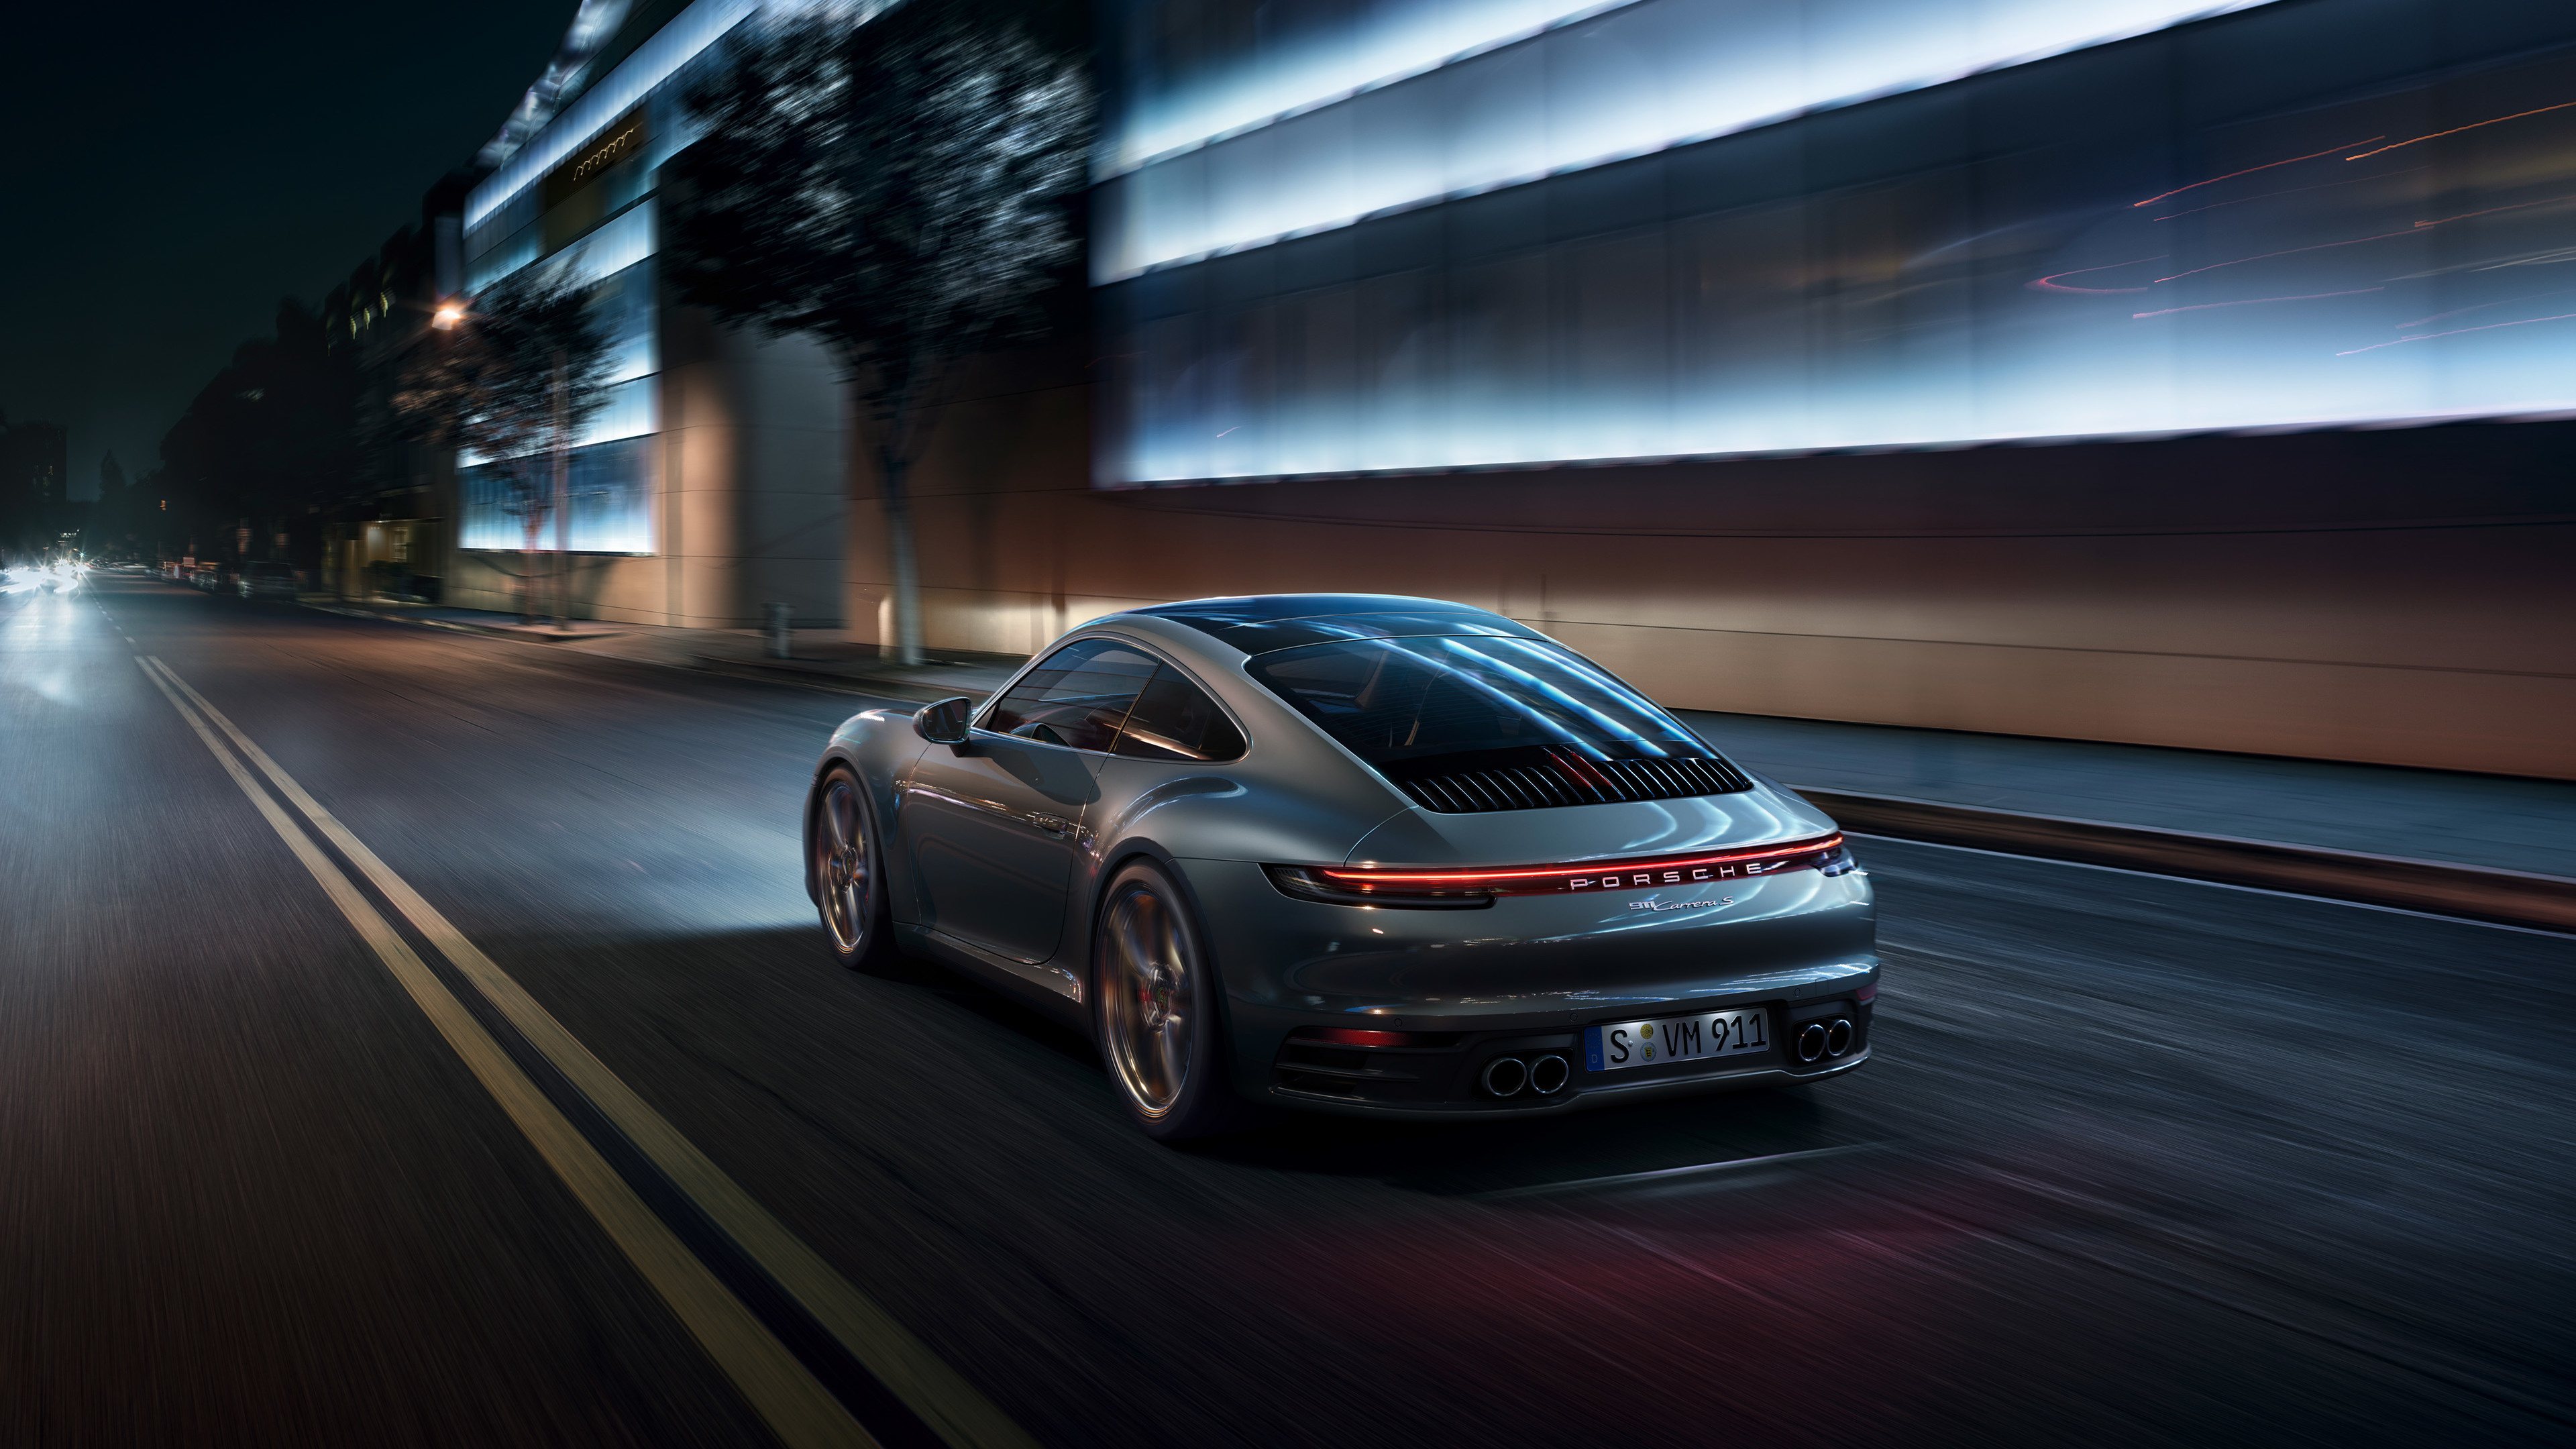 porsche 911 rear 4k 1547937298 - Porsche 911 Rear 4k - porsche wallpapers, porsche 911 wallpapers, hd-wallpapers, cars wallpapers, behance wallpapers, 4k-wallpapers, 2018 cars wallpapers